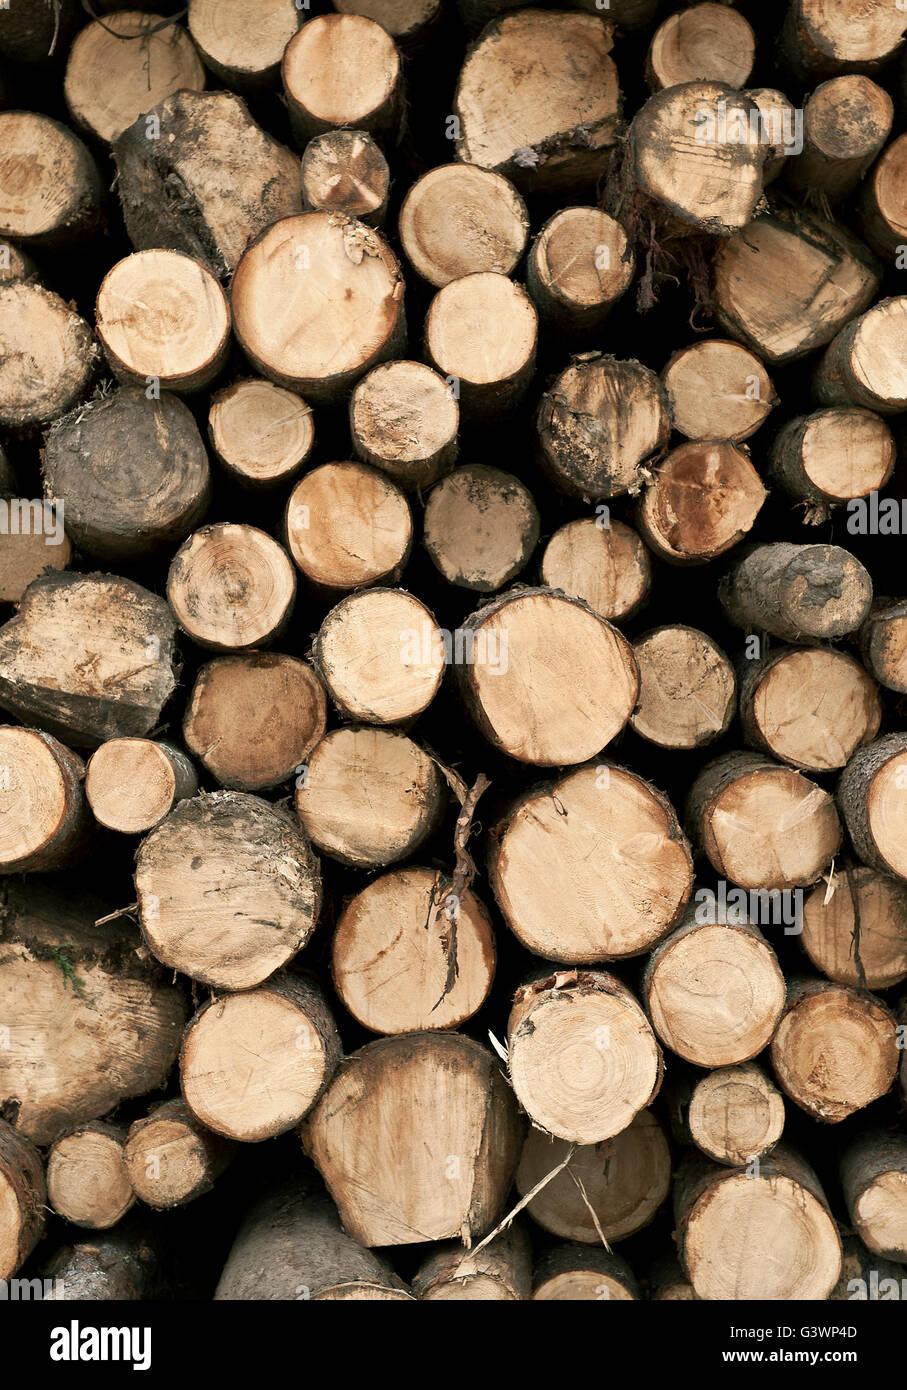 Pilas de madera áspera, Vermont, EE.UU. Imagen De Stock